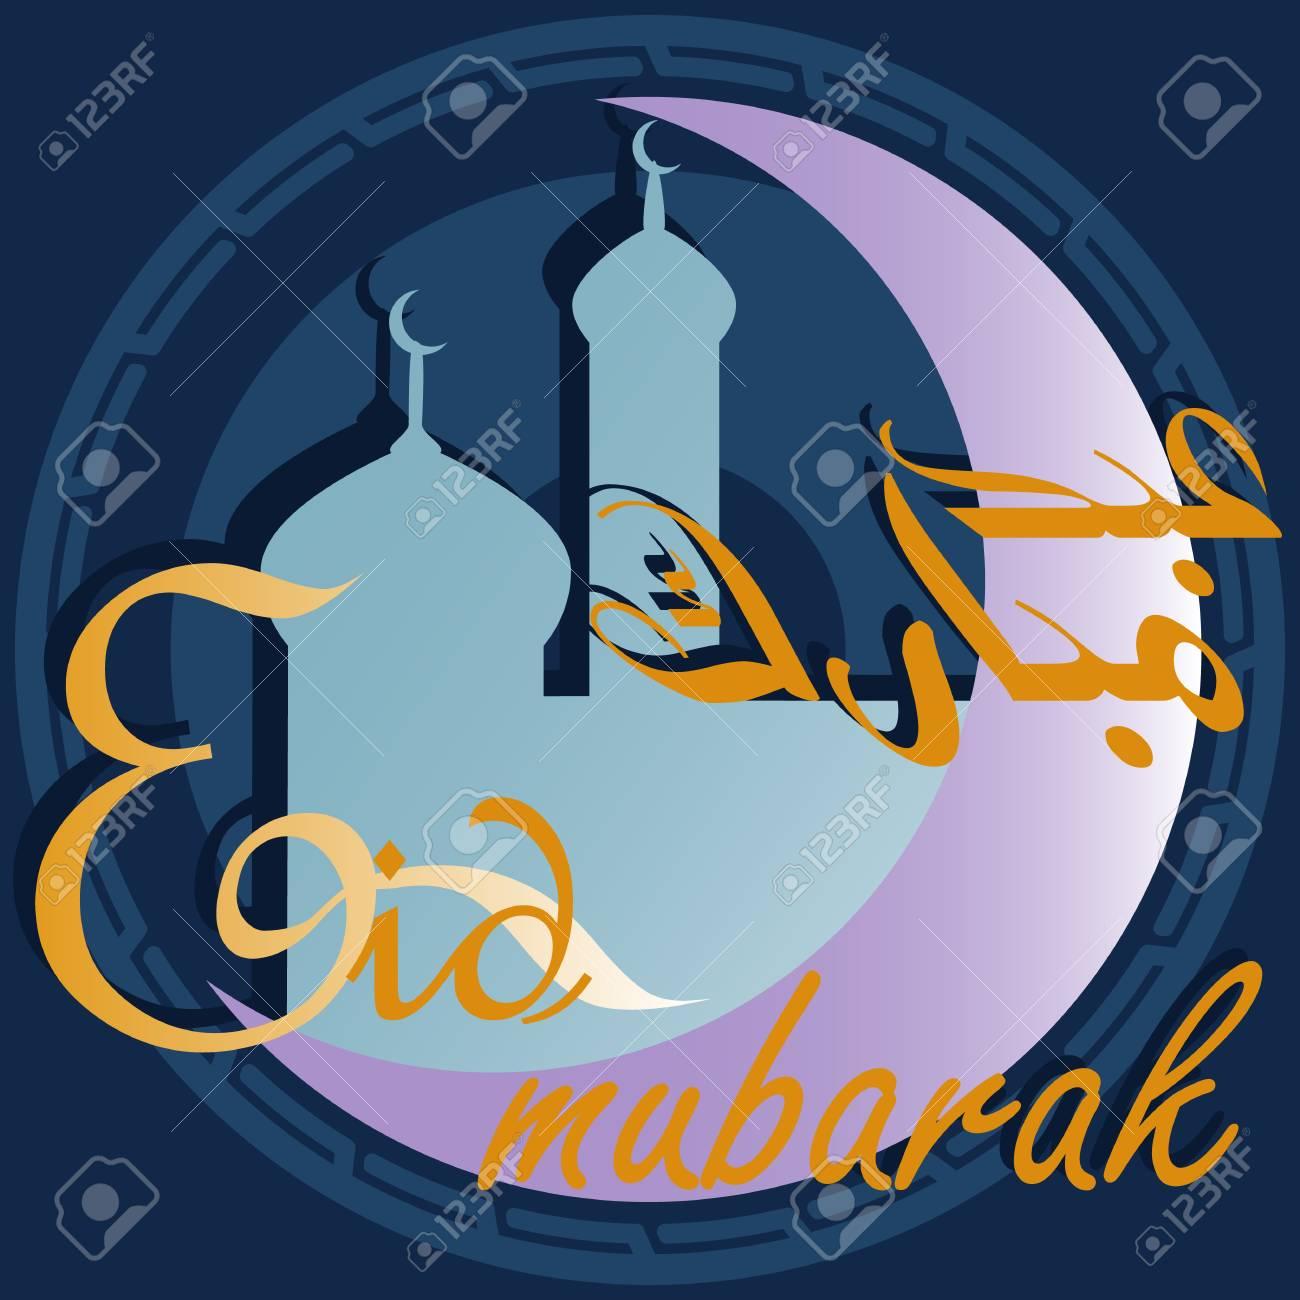 Eid mubarak greeting in english and arabic wishing blessed ramadan eid mubarak greeting in english and arabic wishing blessed ramadan holiday stock vector 67558384 m4hsunfo